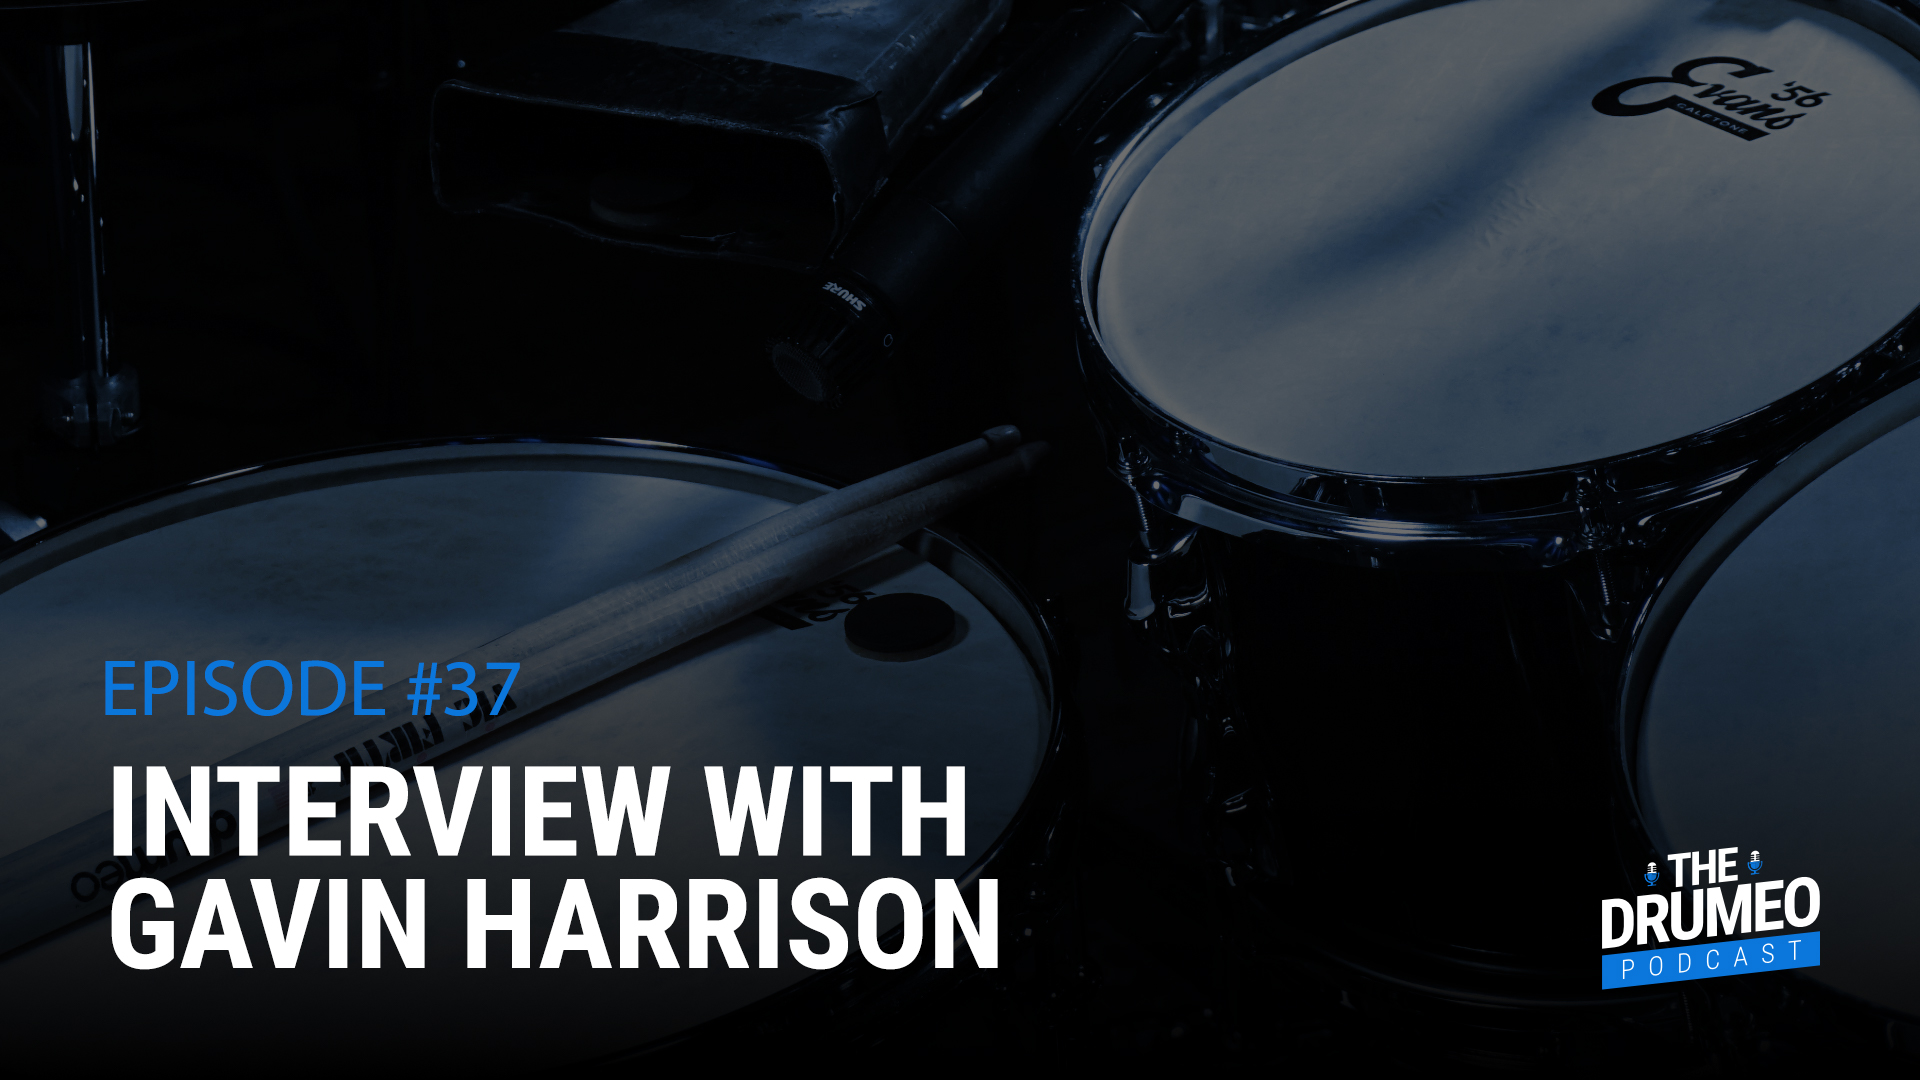 Gavin Harrison, One Of King Crimsons Drummer And Former Porcupine